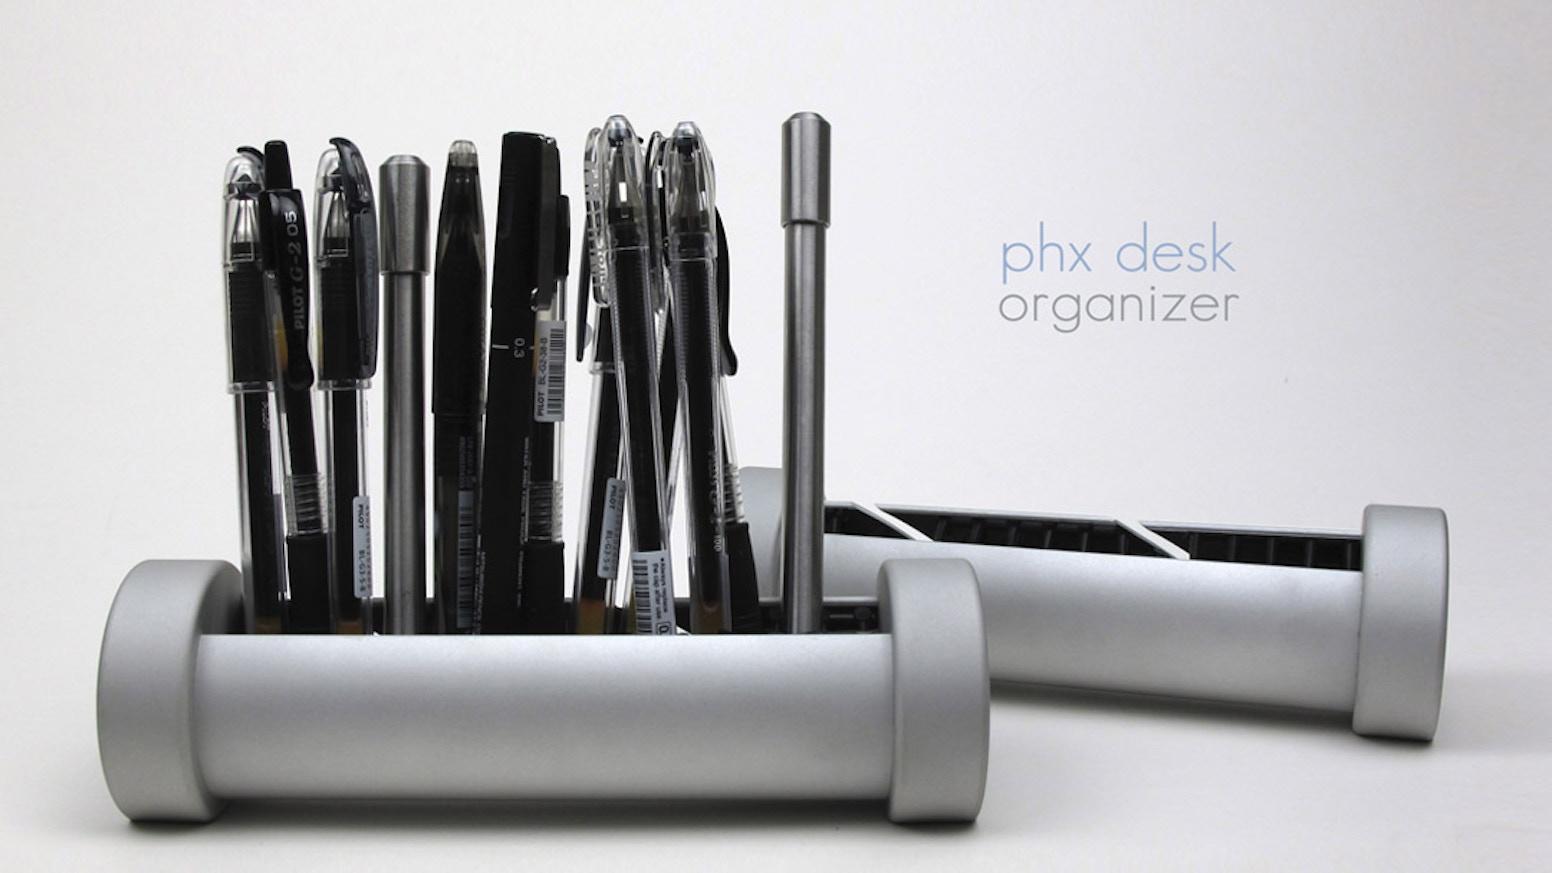 Versatile anodized aluminum desk organizer that makes your favorite pens,  iphones, and even your